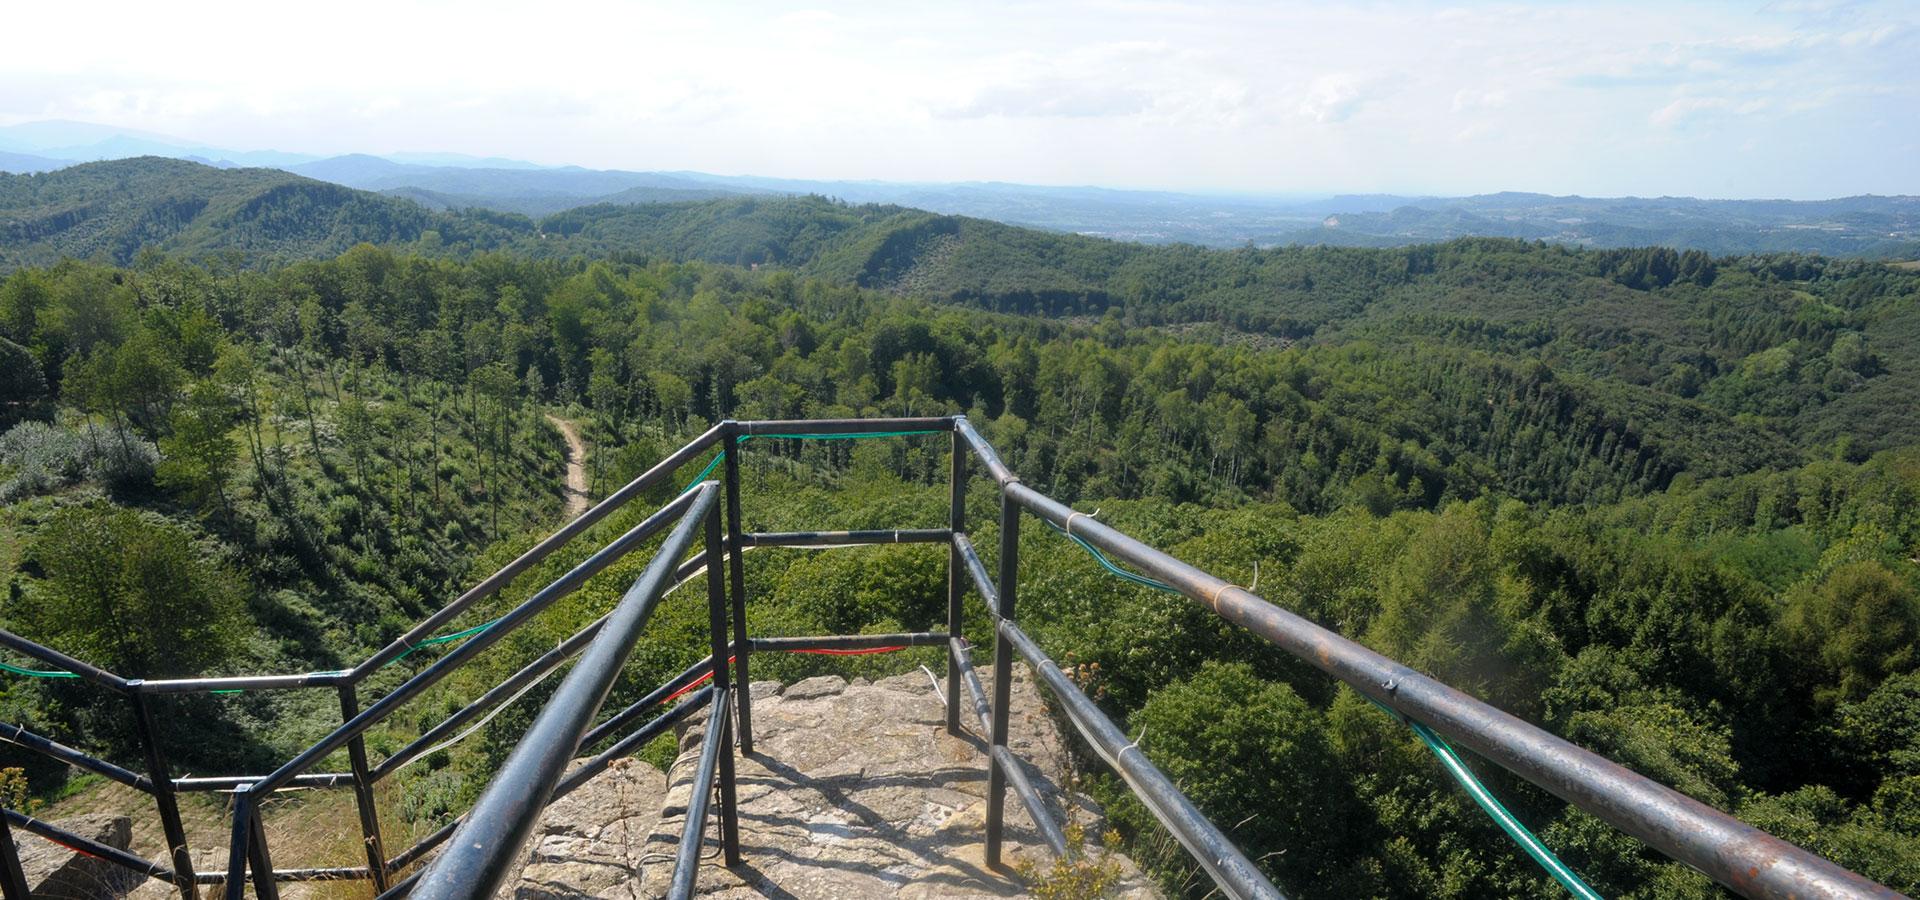 torre-castelnuovo-di-ceva-6